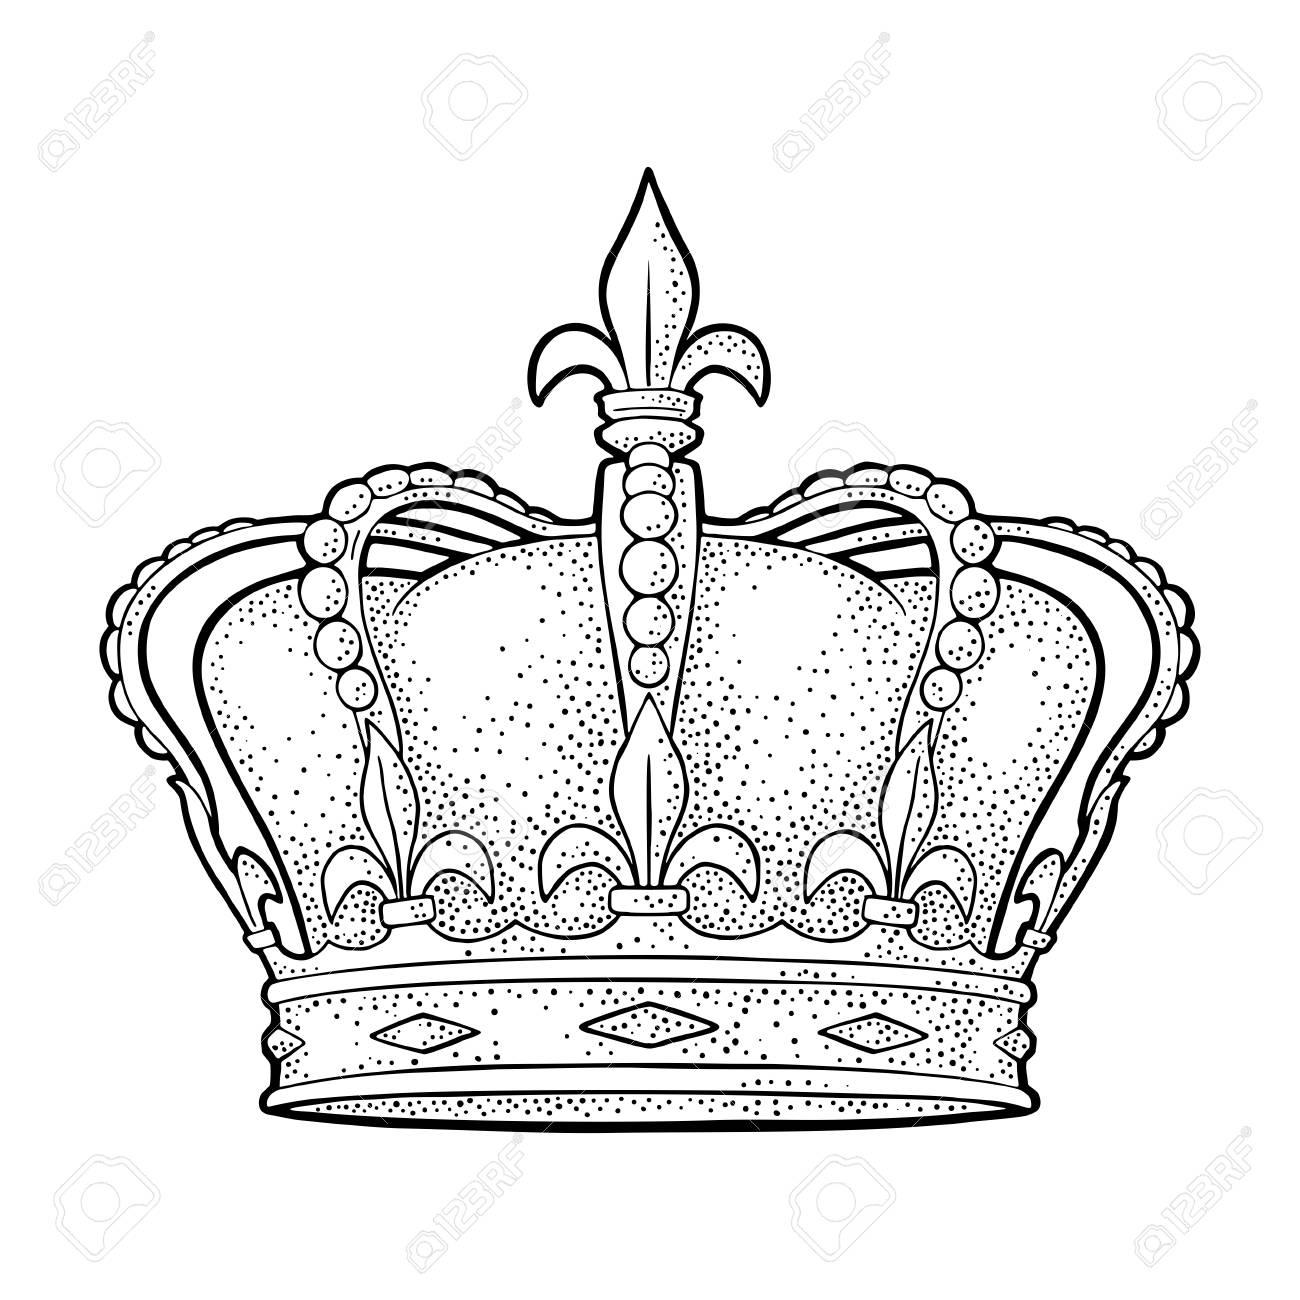 quality design 5b44c c3c7e King crown. Engraving vintage vector black illustration. Isolated on white  Stock Illustration - 107649782